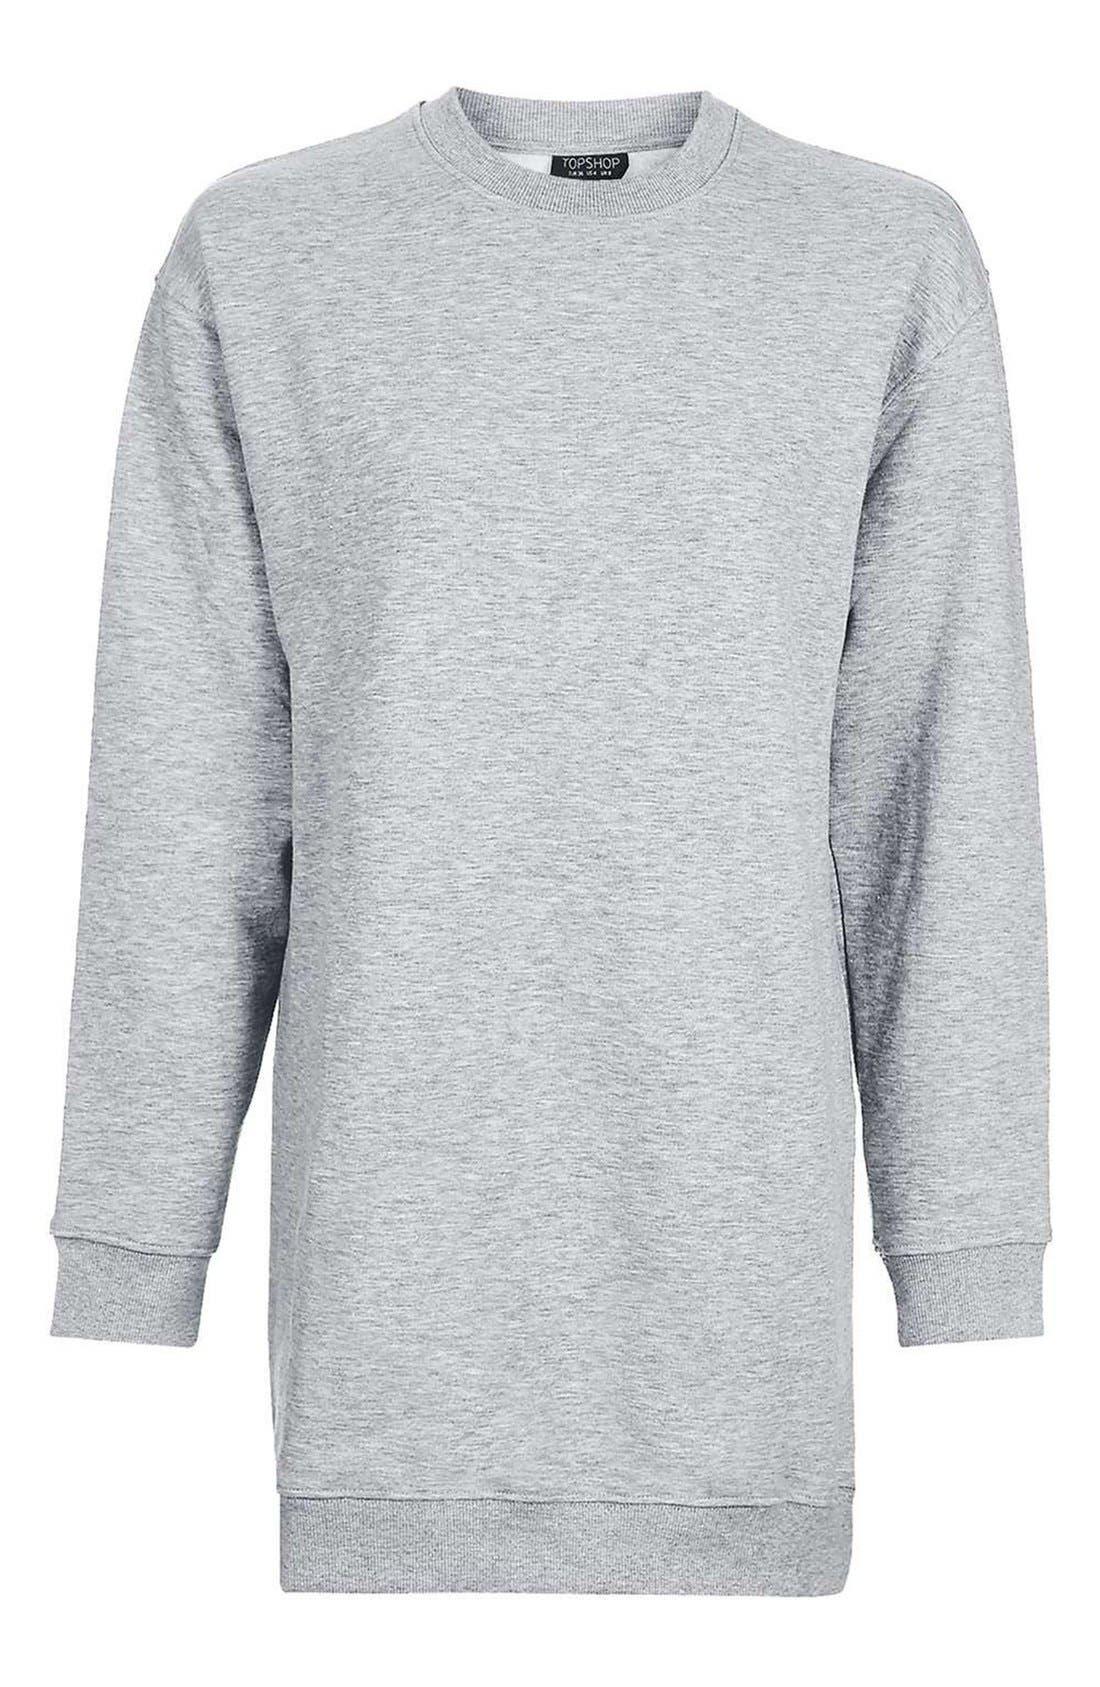 Alternate Image 4  - Topshop Sweatshirt Tunic